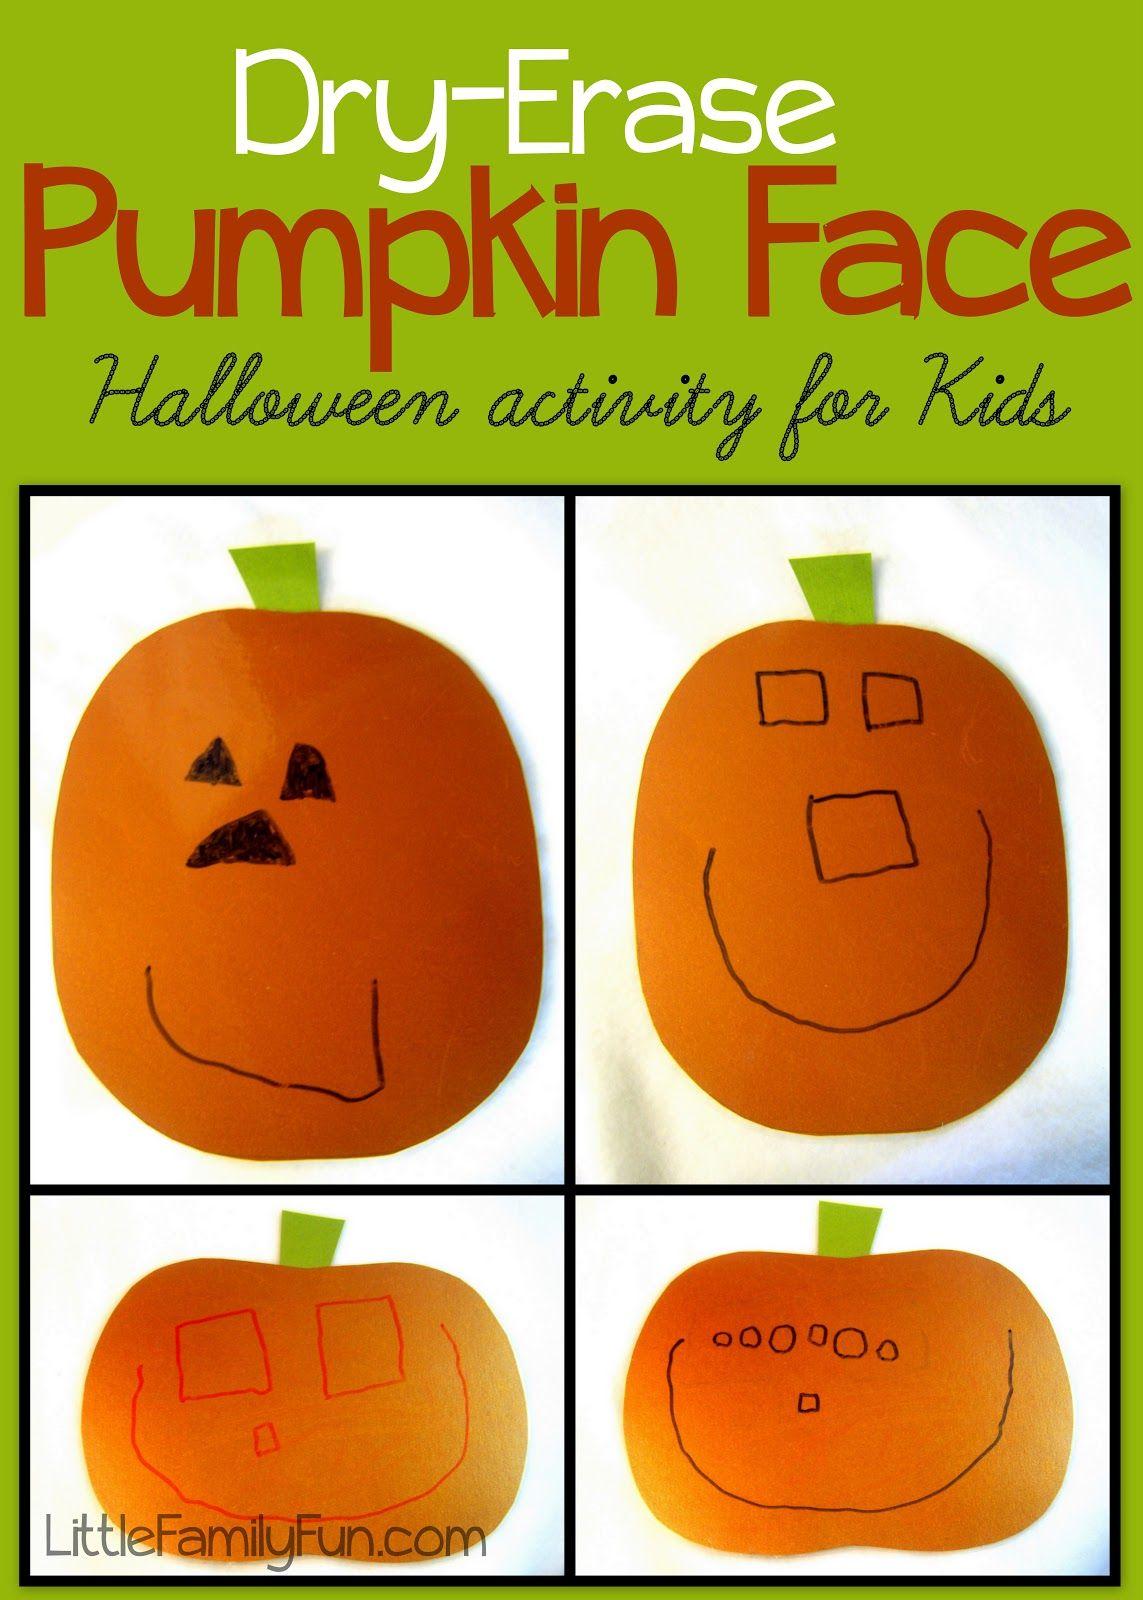 Dry Erase Pumpkin Face